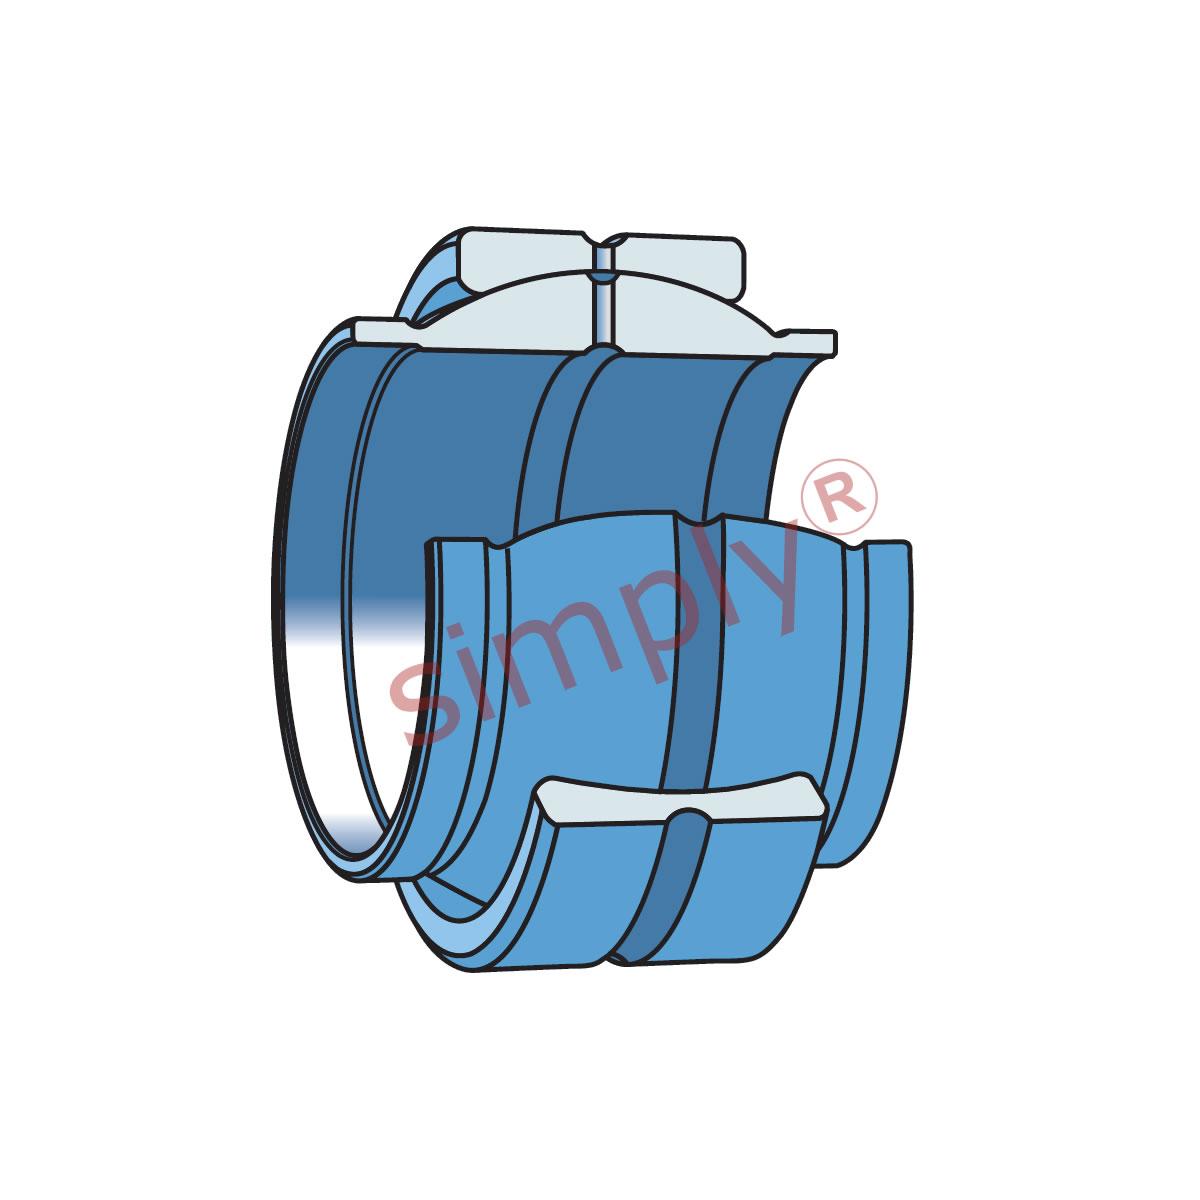 Extended Inner SKF Spherical 16mm x 28mm x 16mm GE16LO